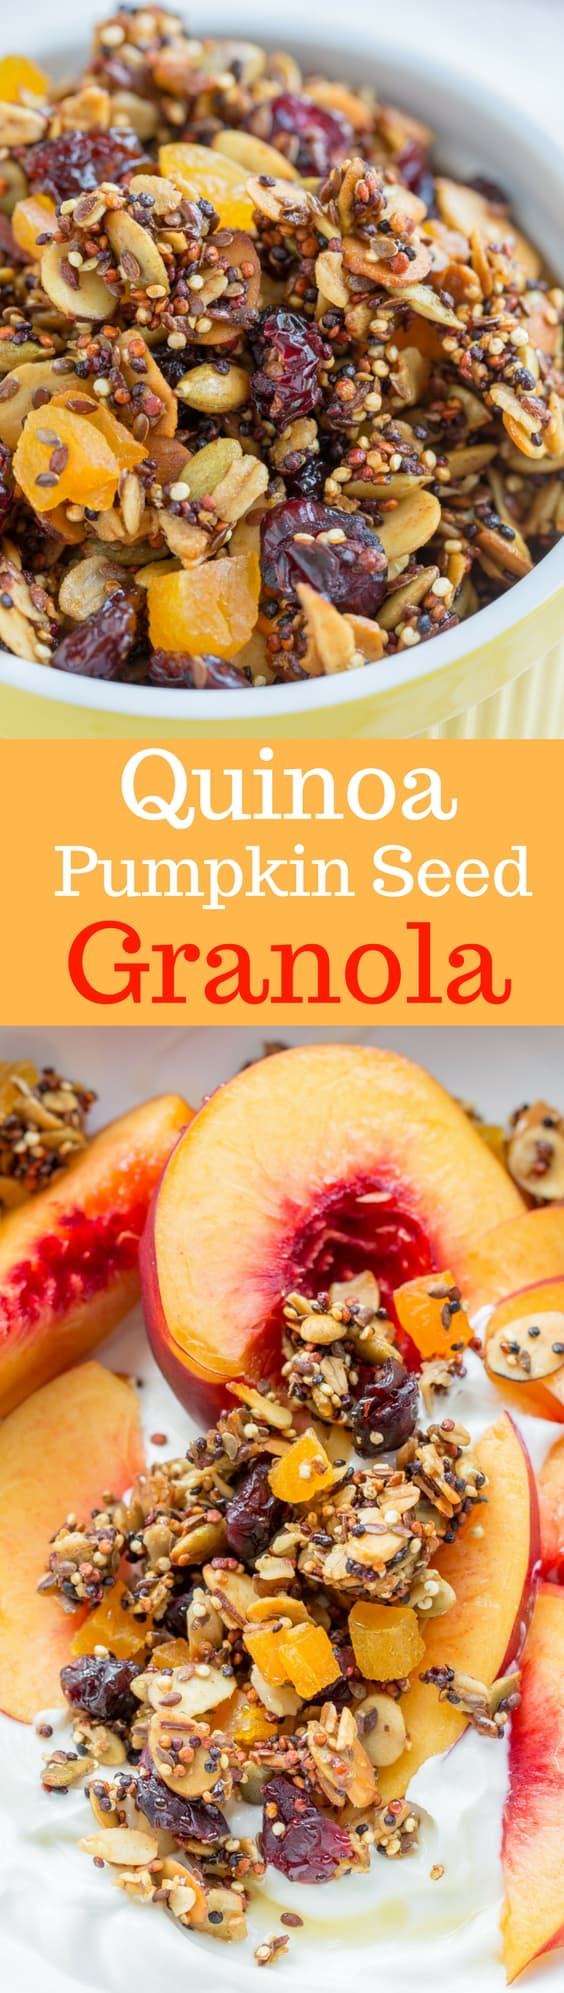 Quinoa-Pumpkin Seed Granola | www.savingdessert.com